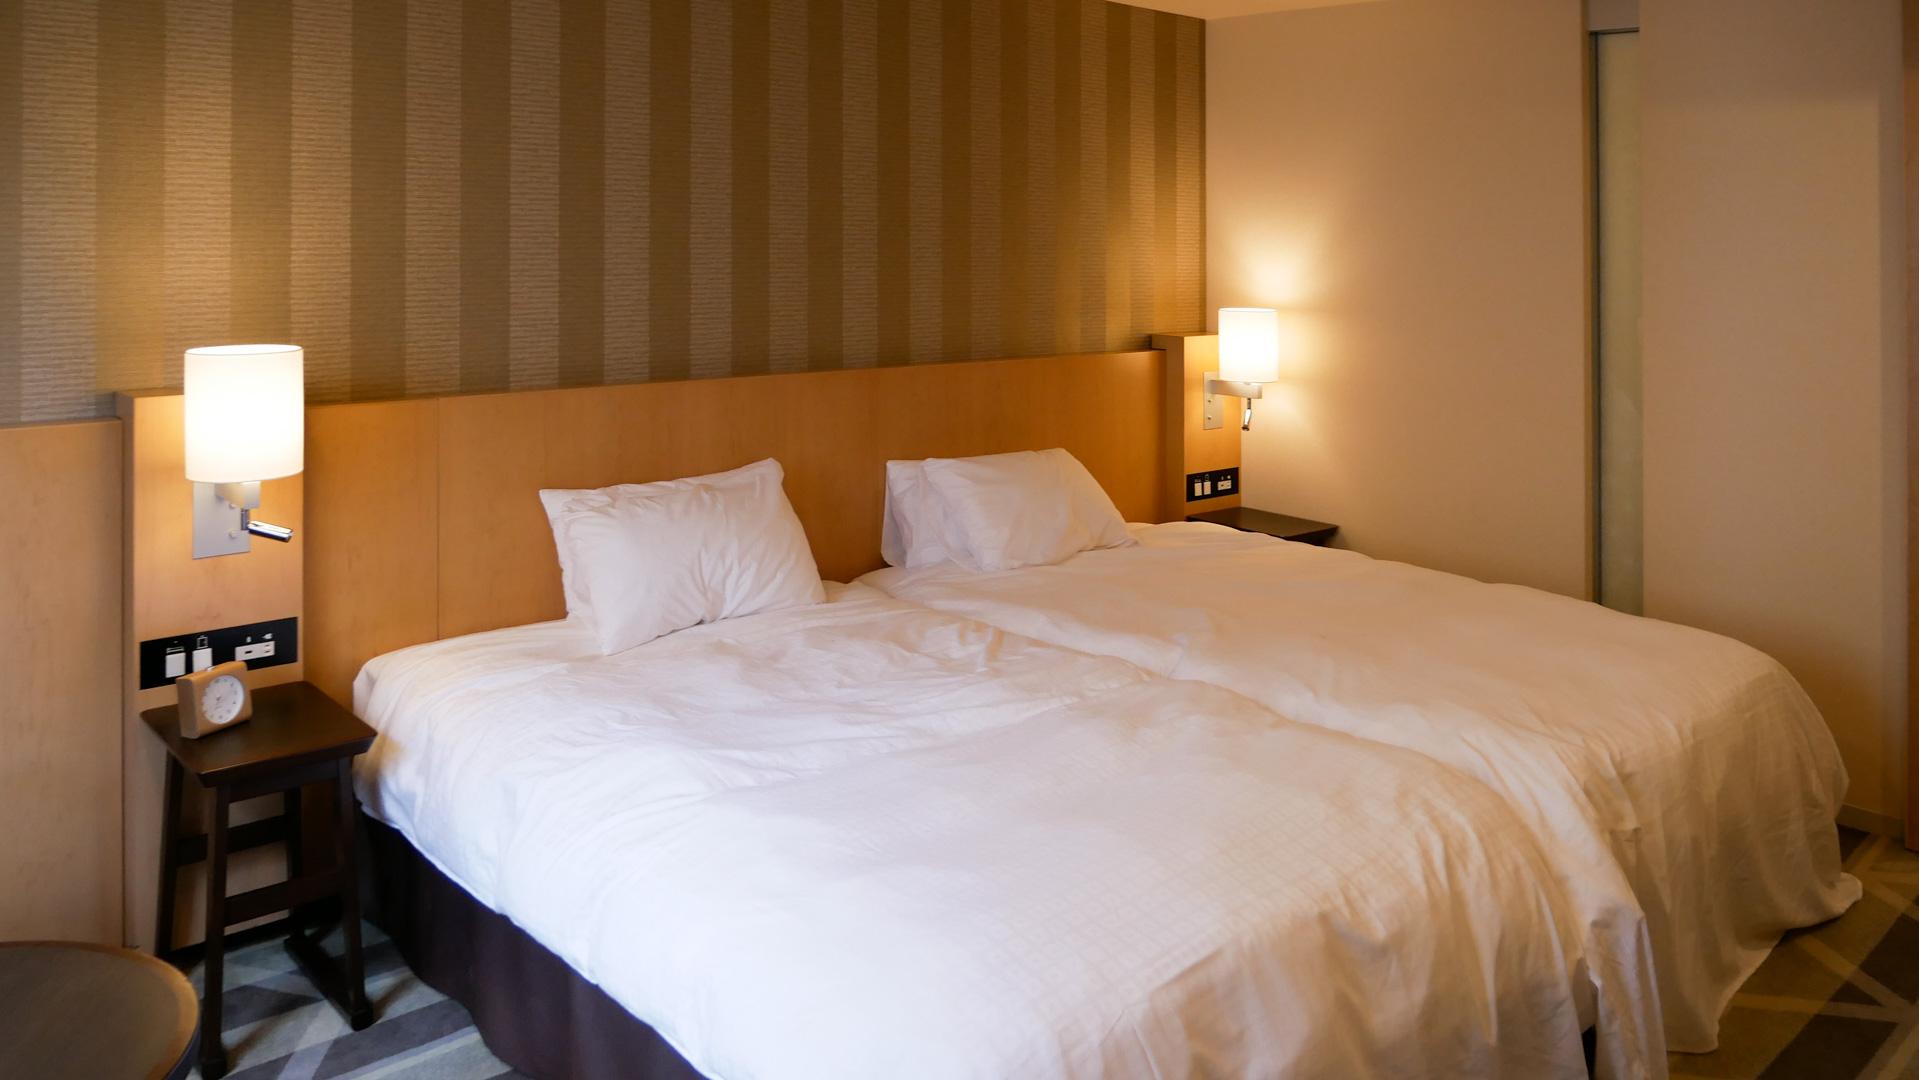 shiba park hotel in tokyo fittwotravel.com